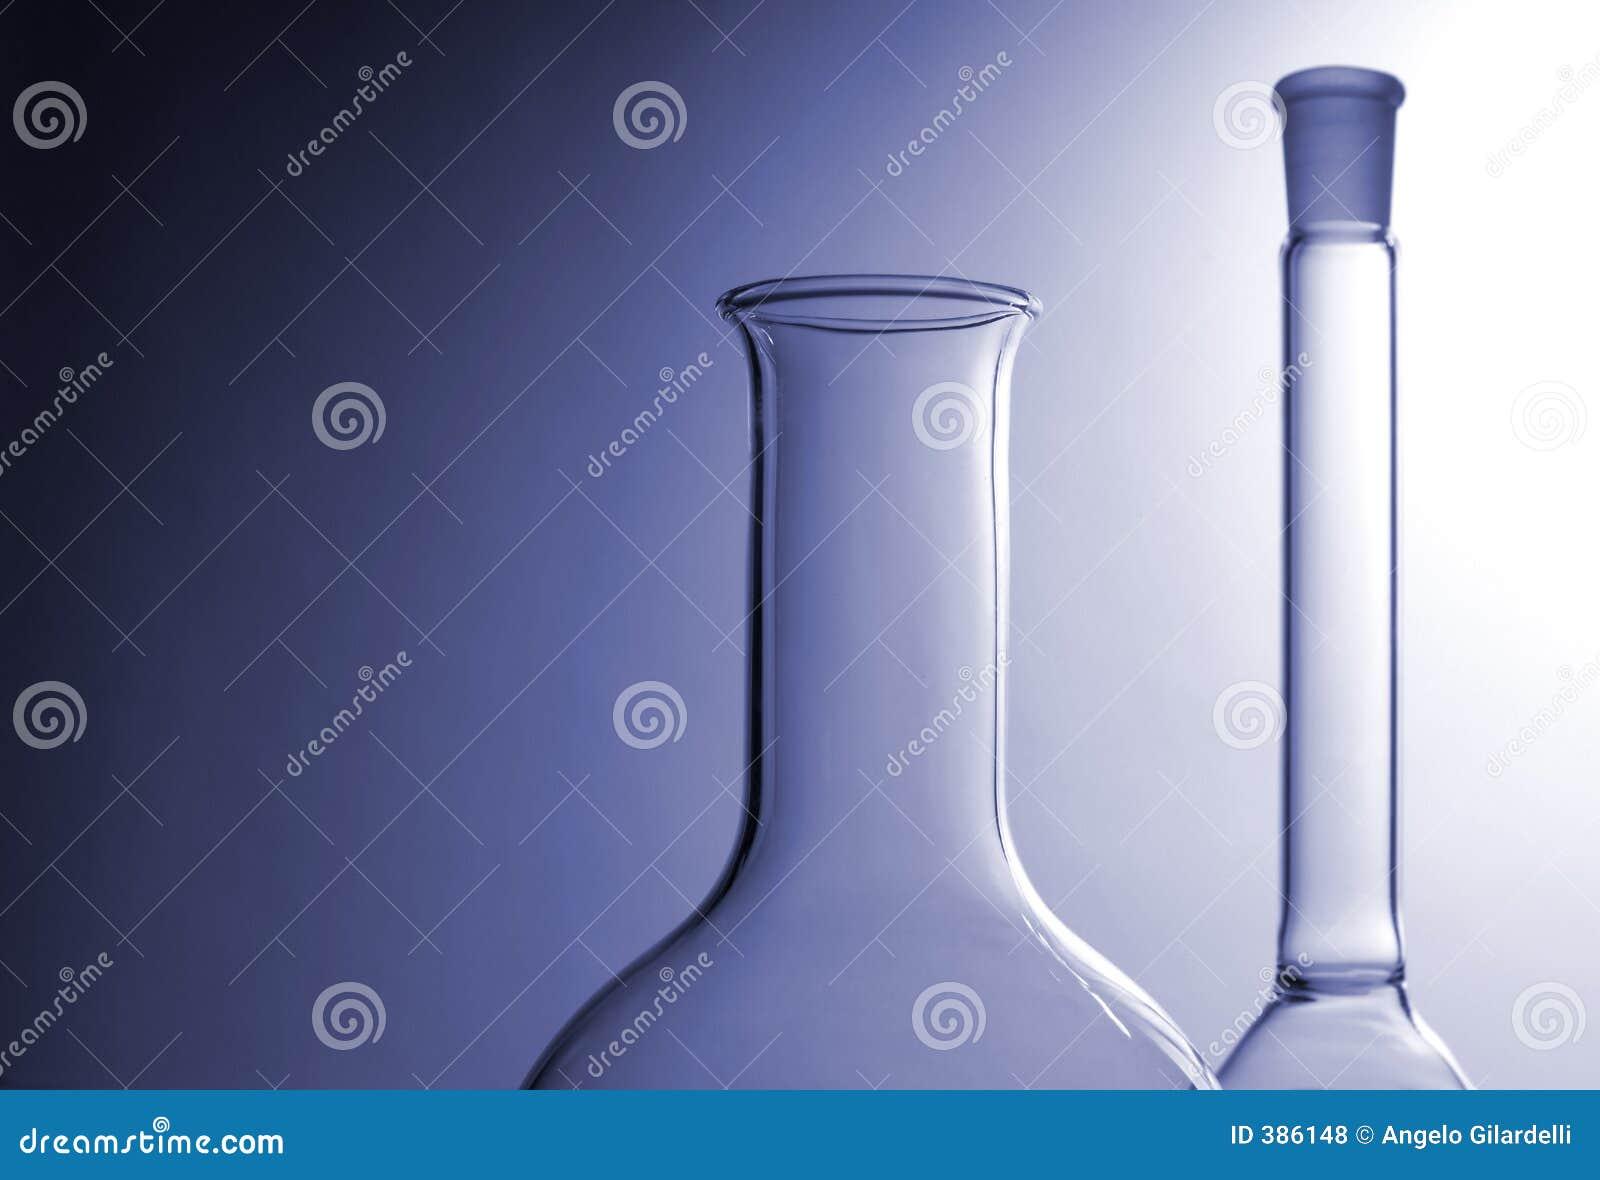 Laboratory glasses